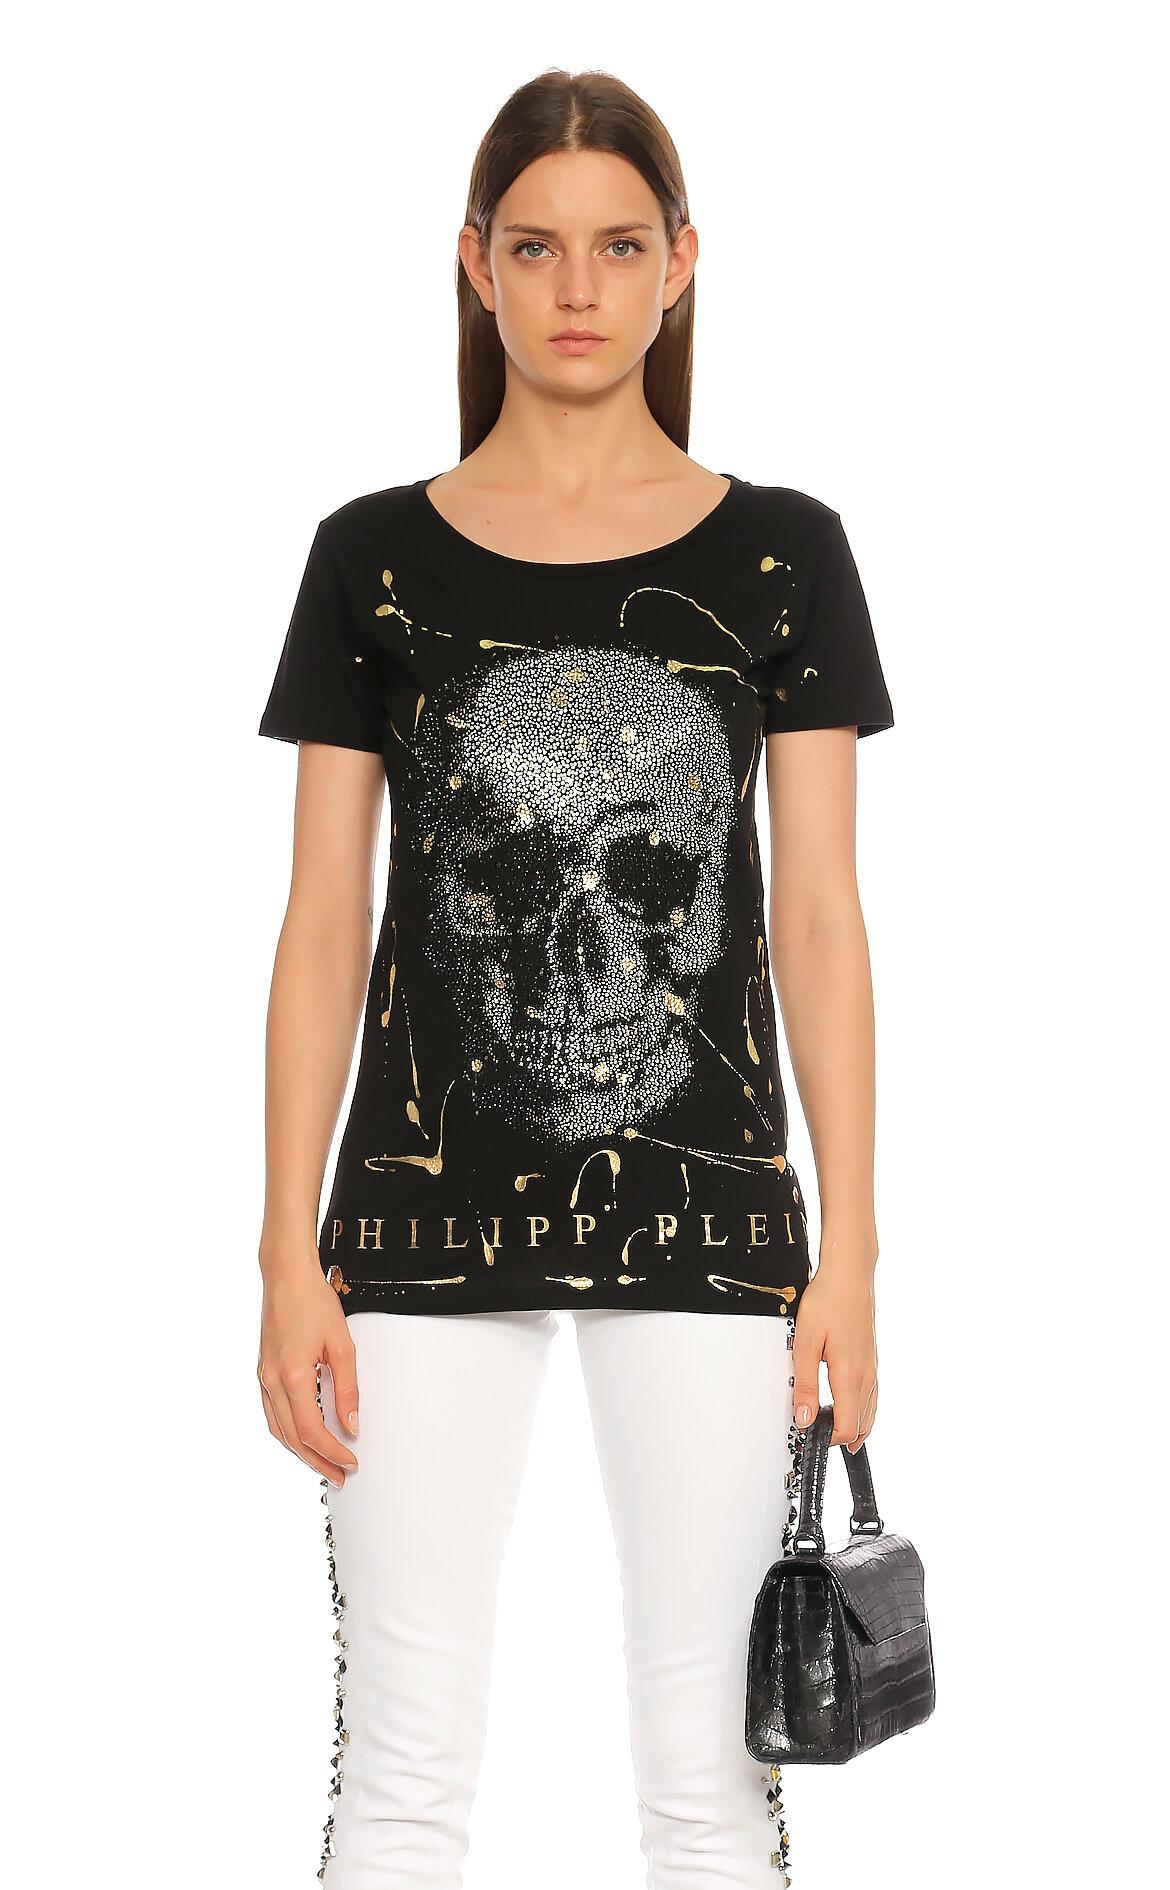 Philipp Plein-Philipp Plein Baskılı Siyah T-Shirt